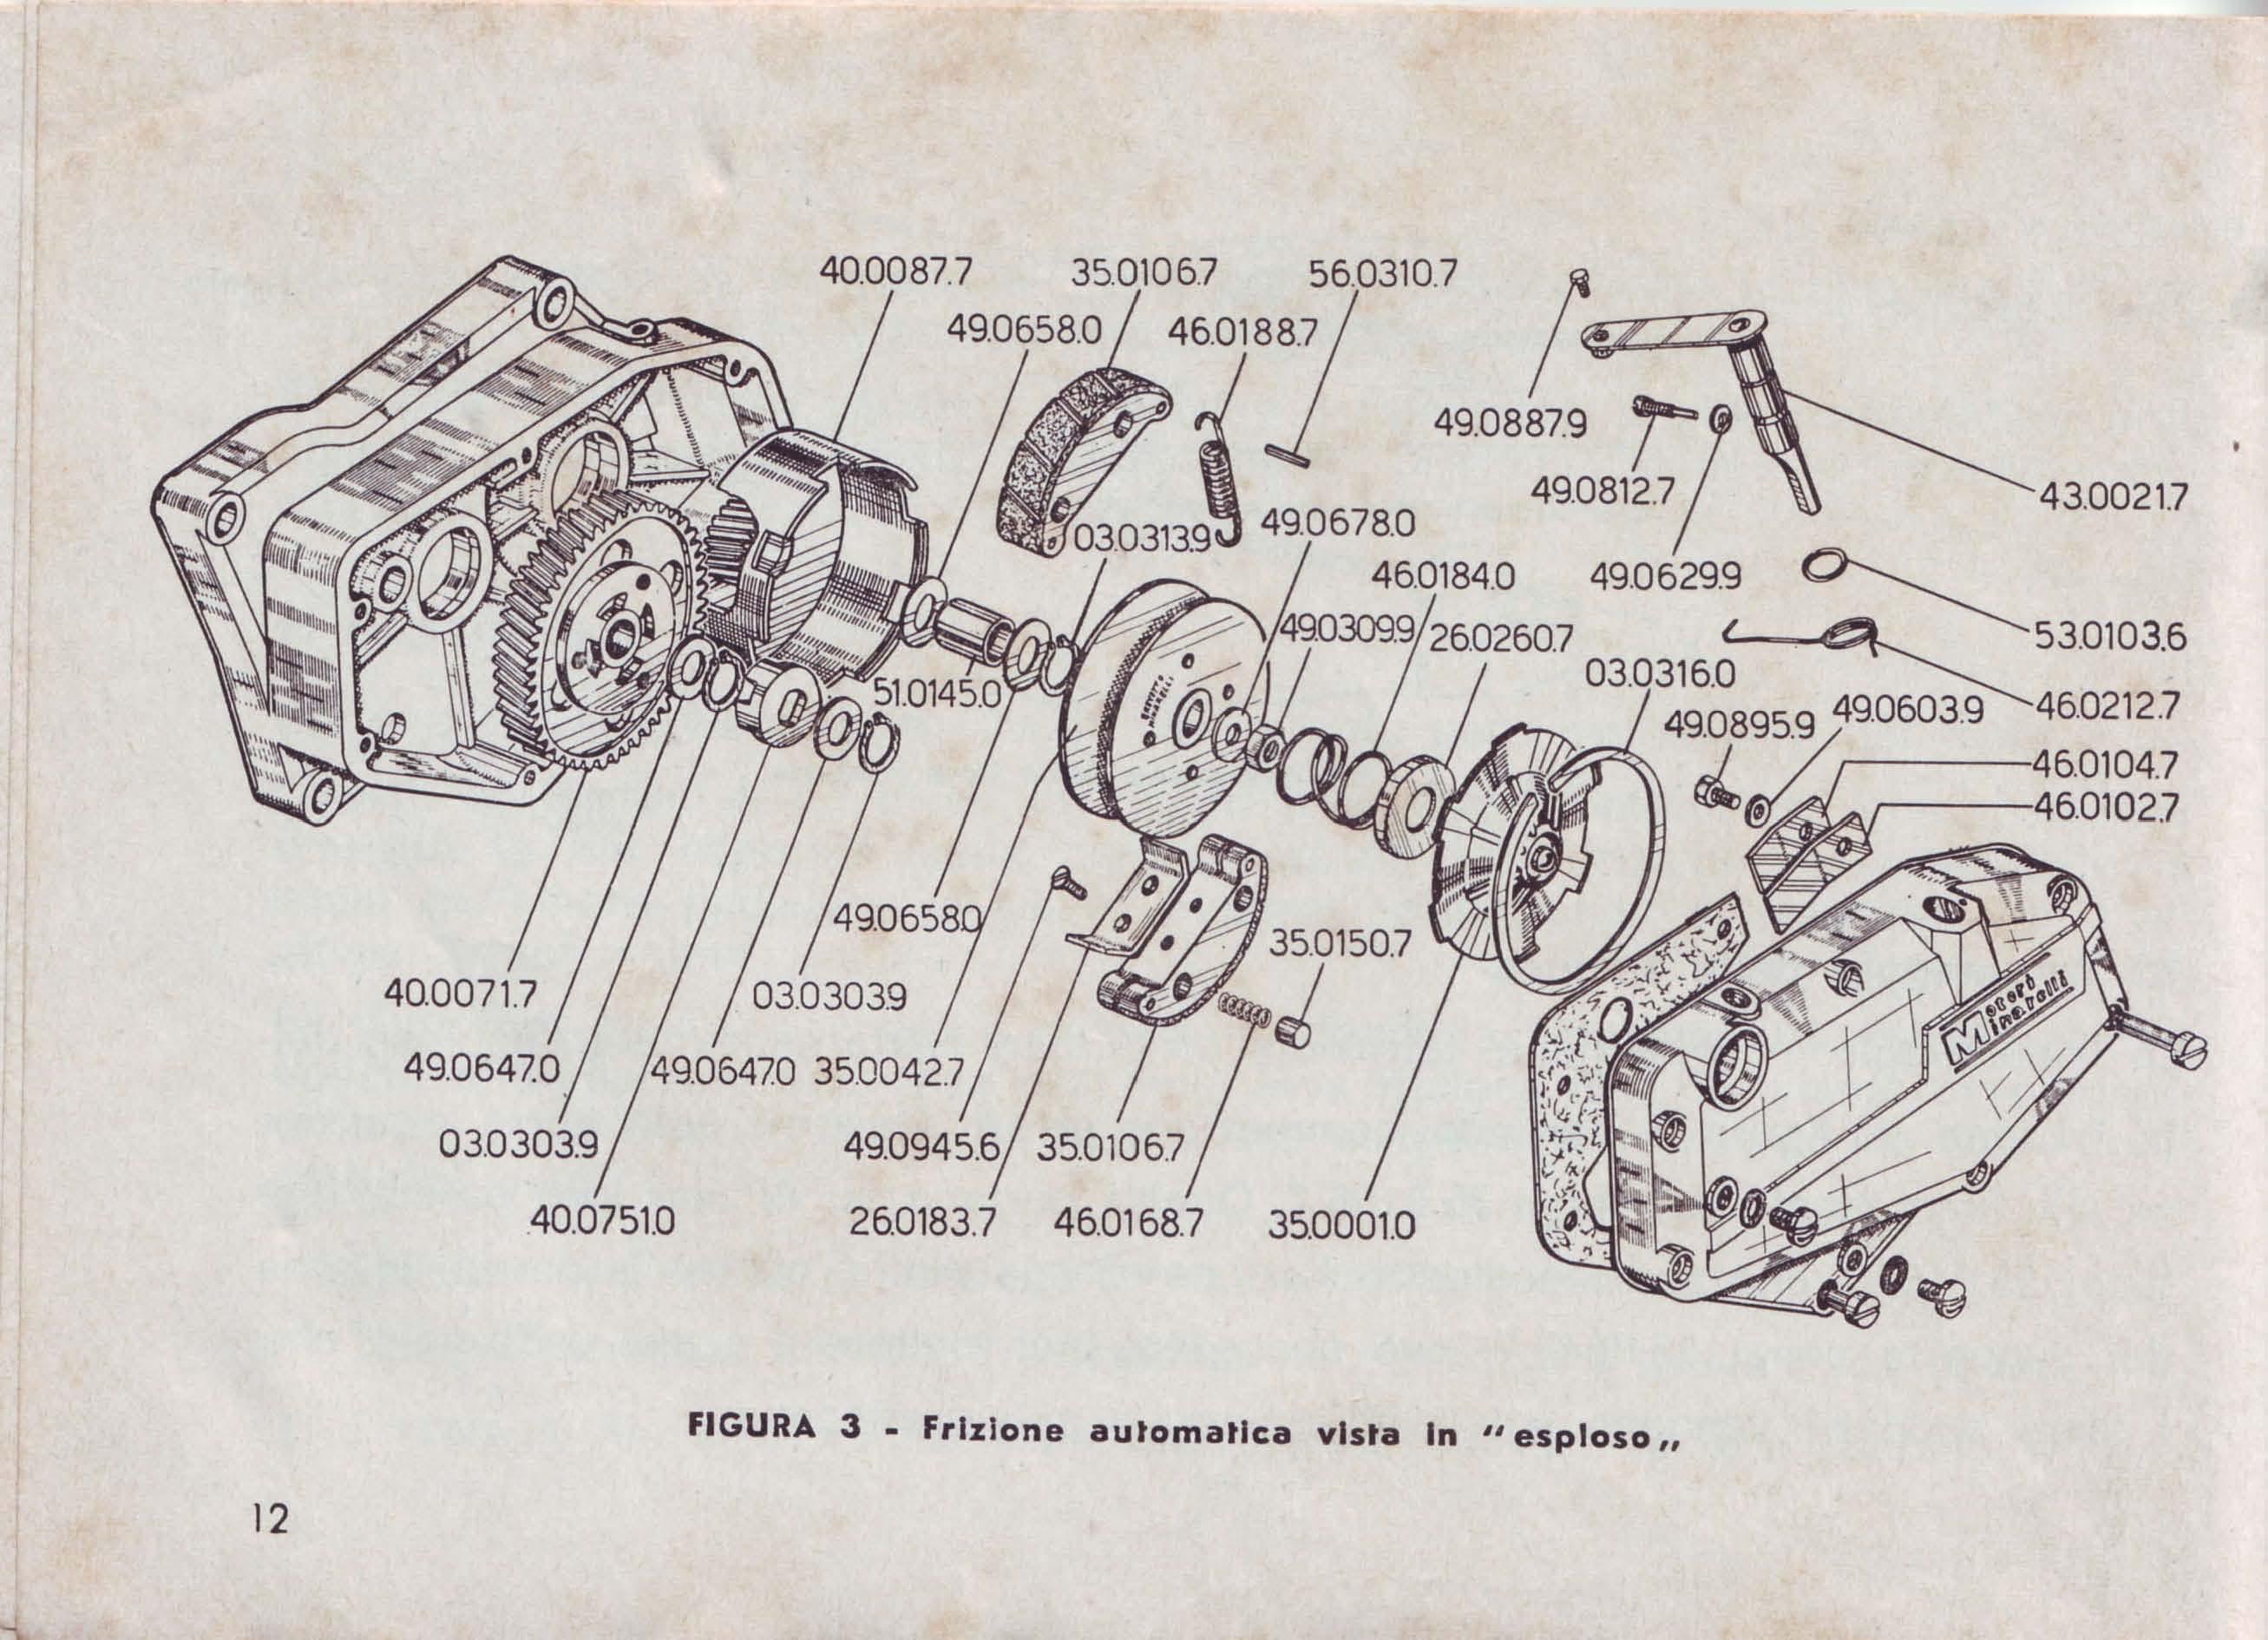 motore minarelli v1 manuale :: cordvenhonee ga